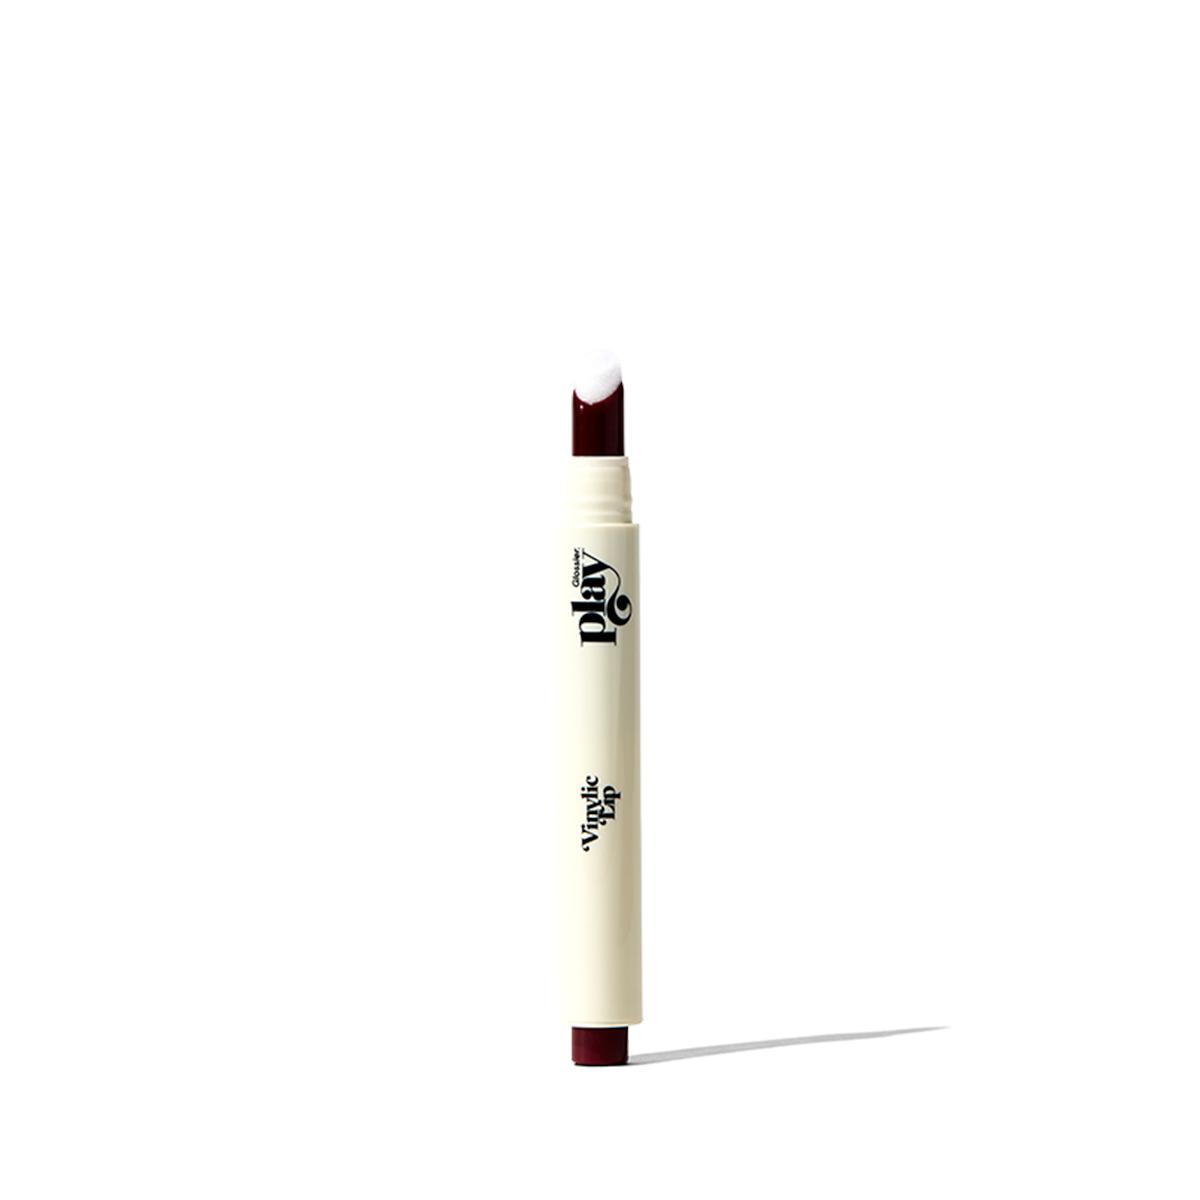 Vinylic Lip